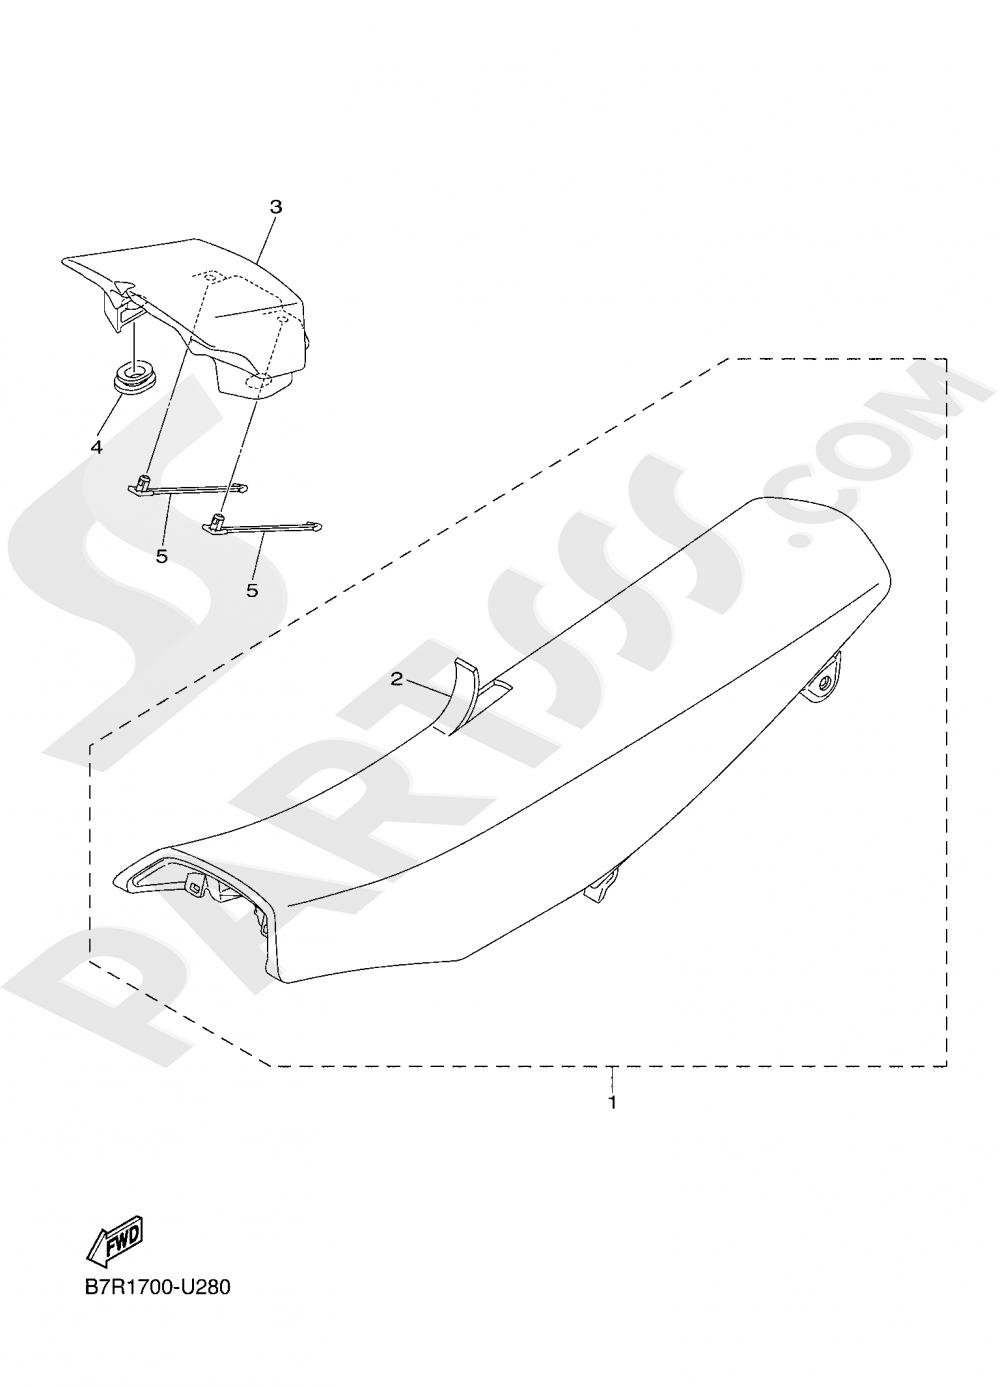 SEAT Yamaha WR250F 2020